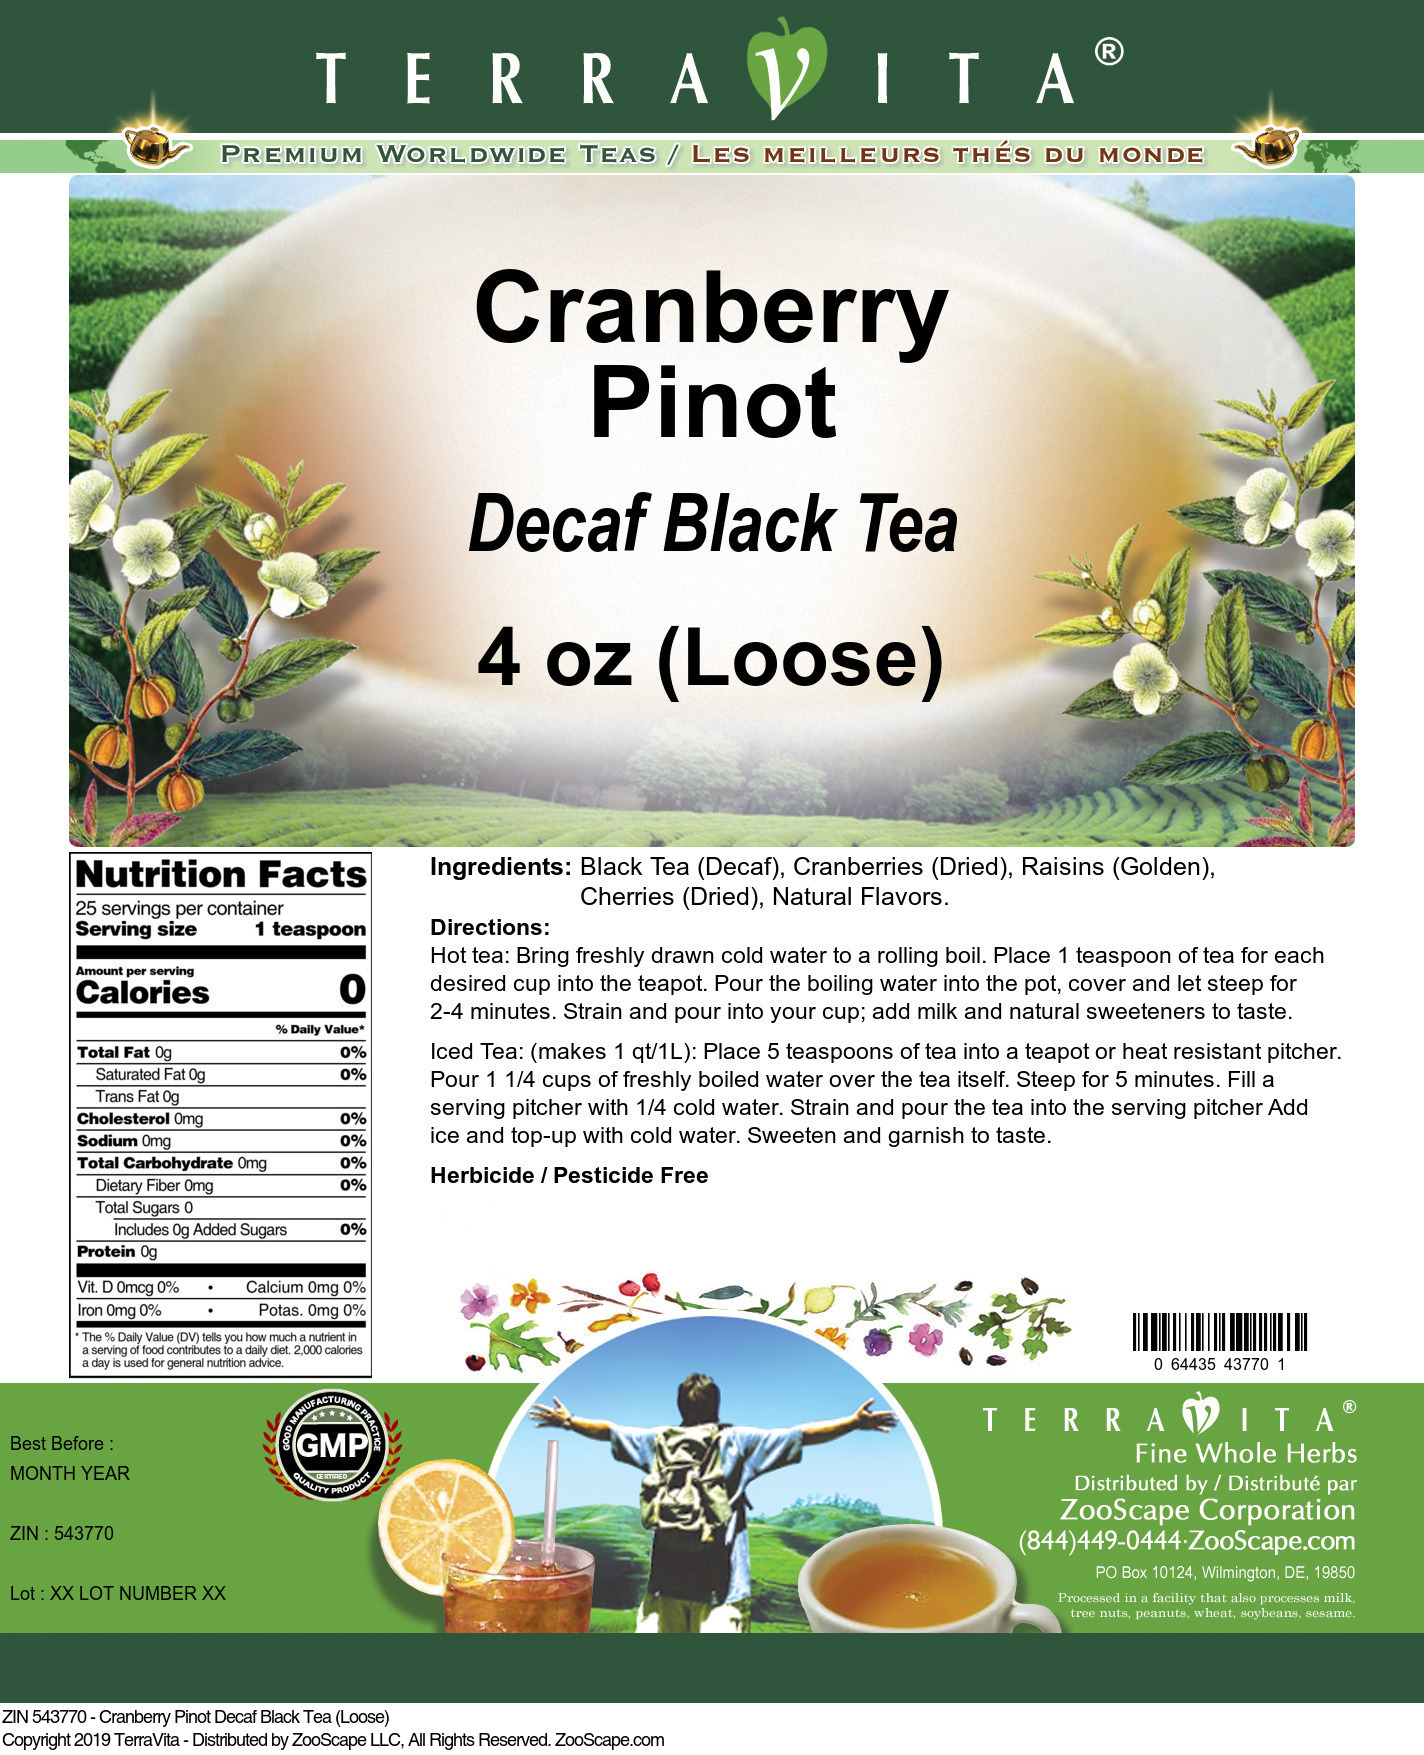 Cranberry Pinot Decaf Black Tea